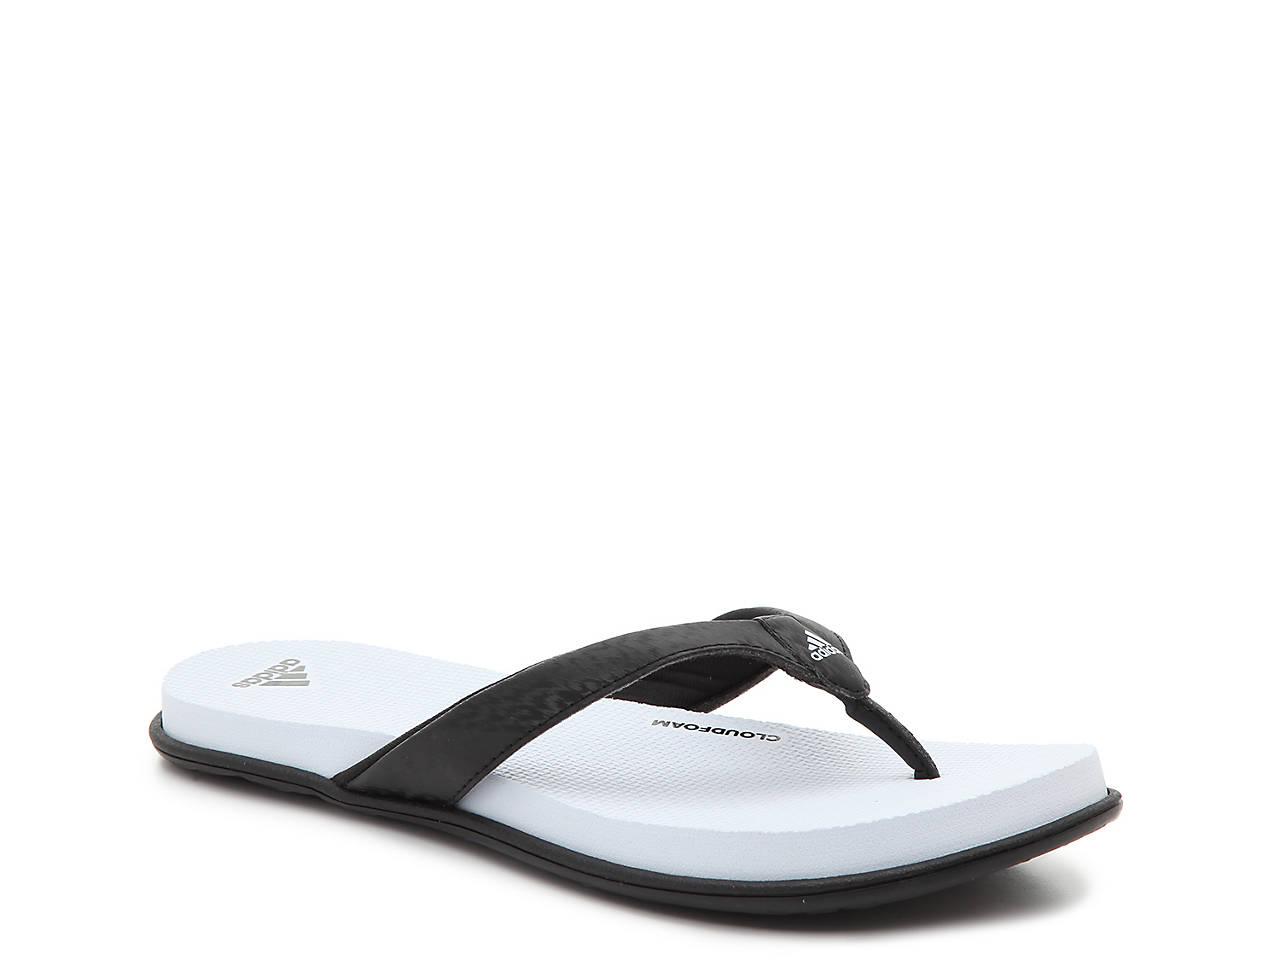 adidas cloudfoam flip flops women